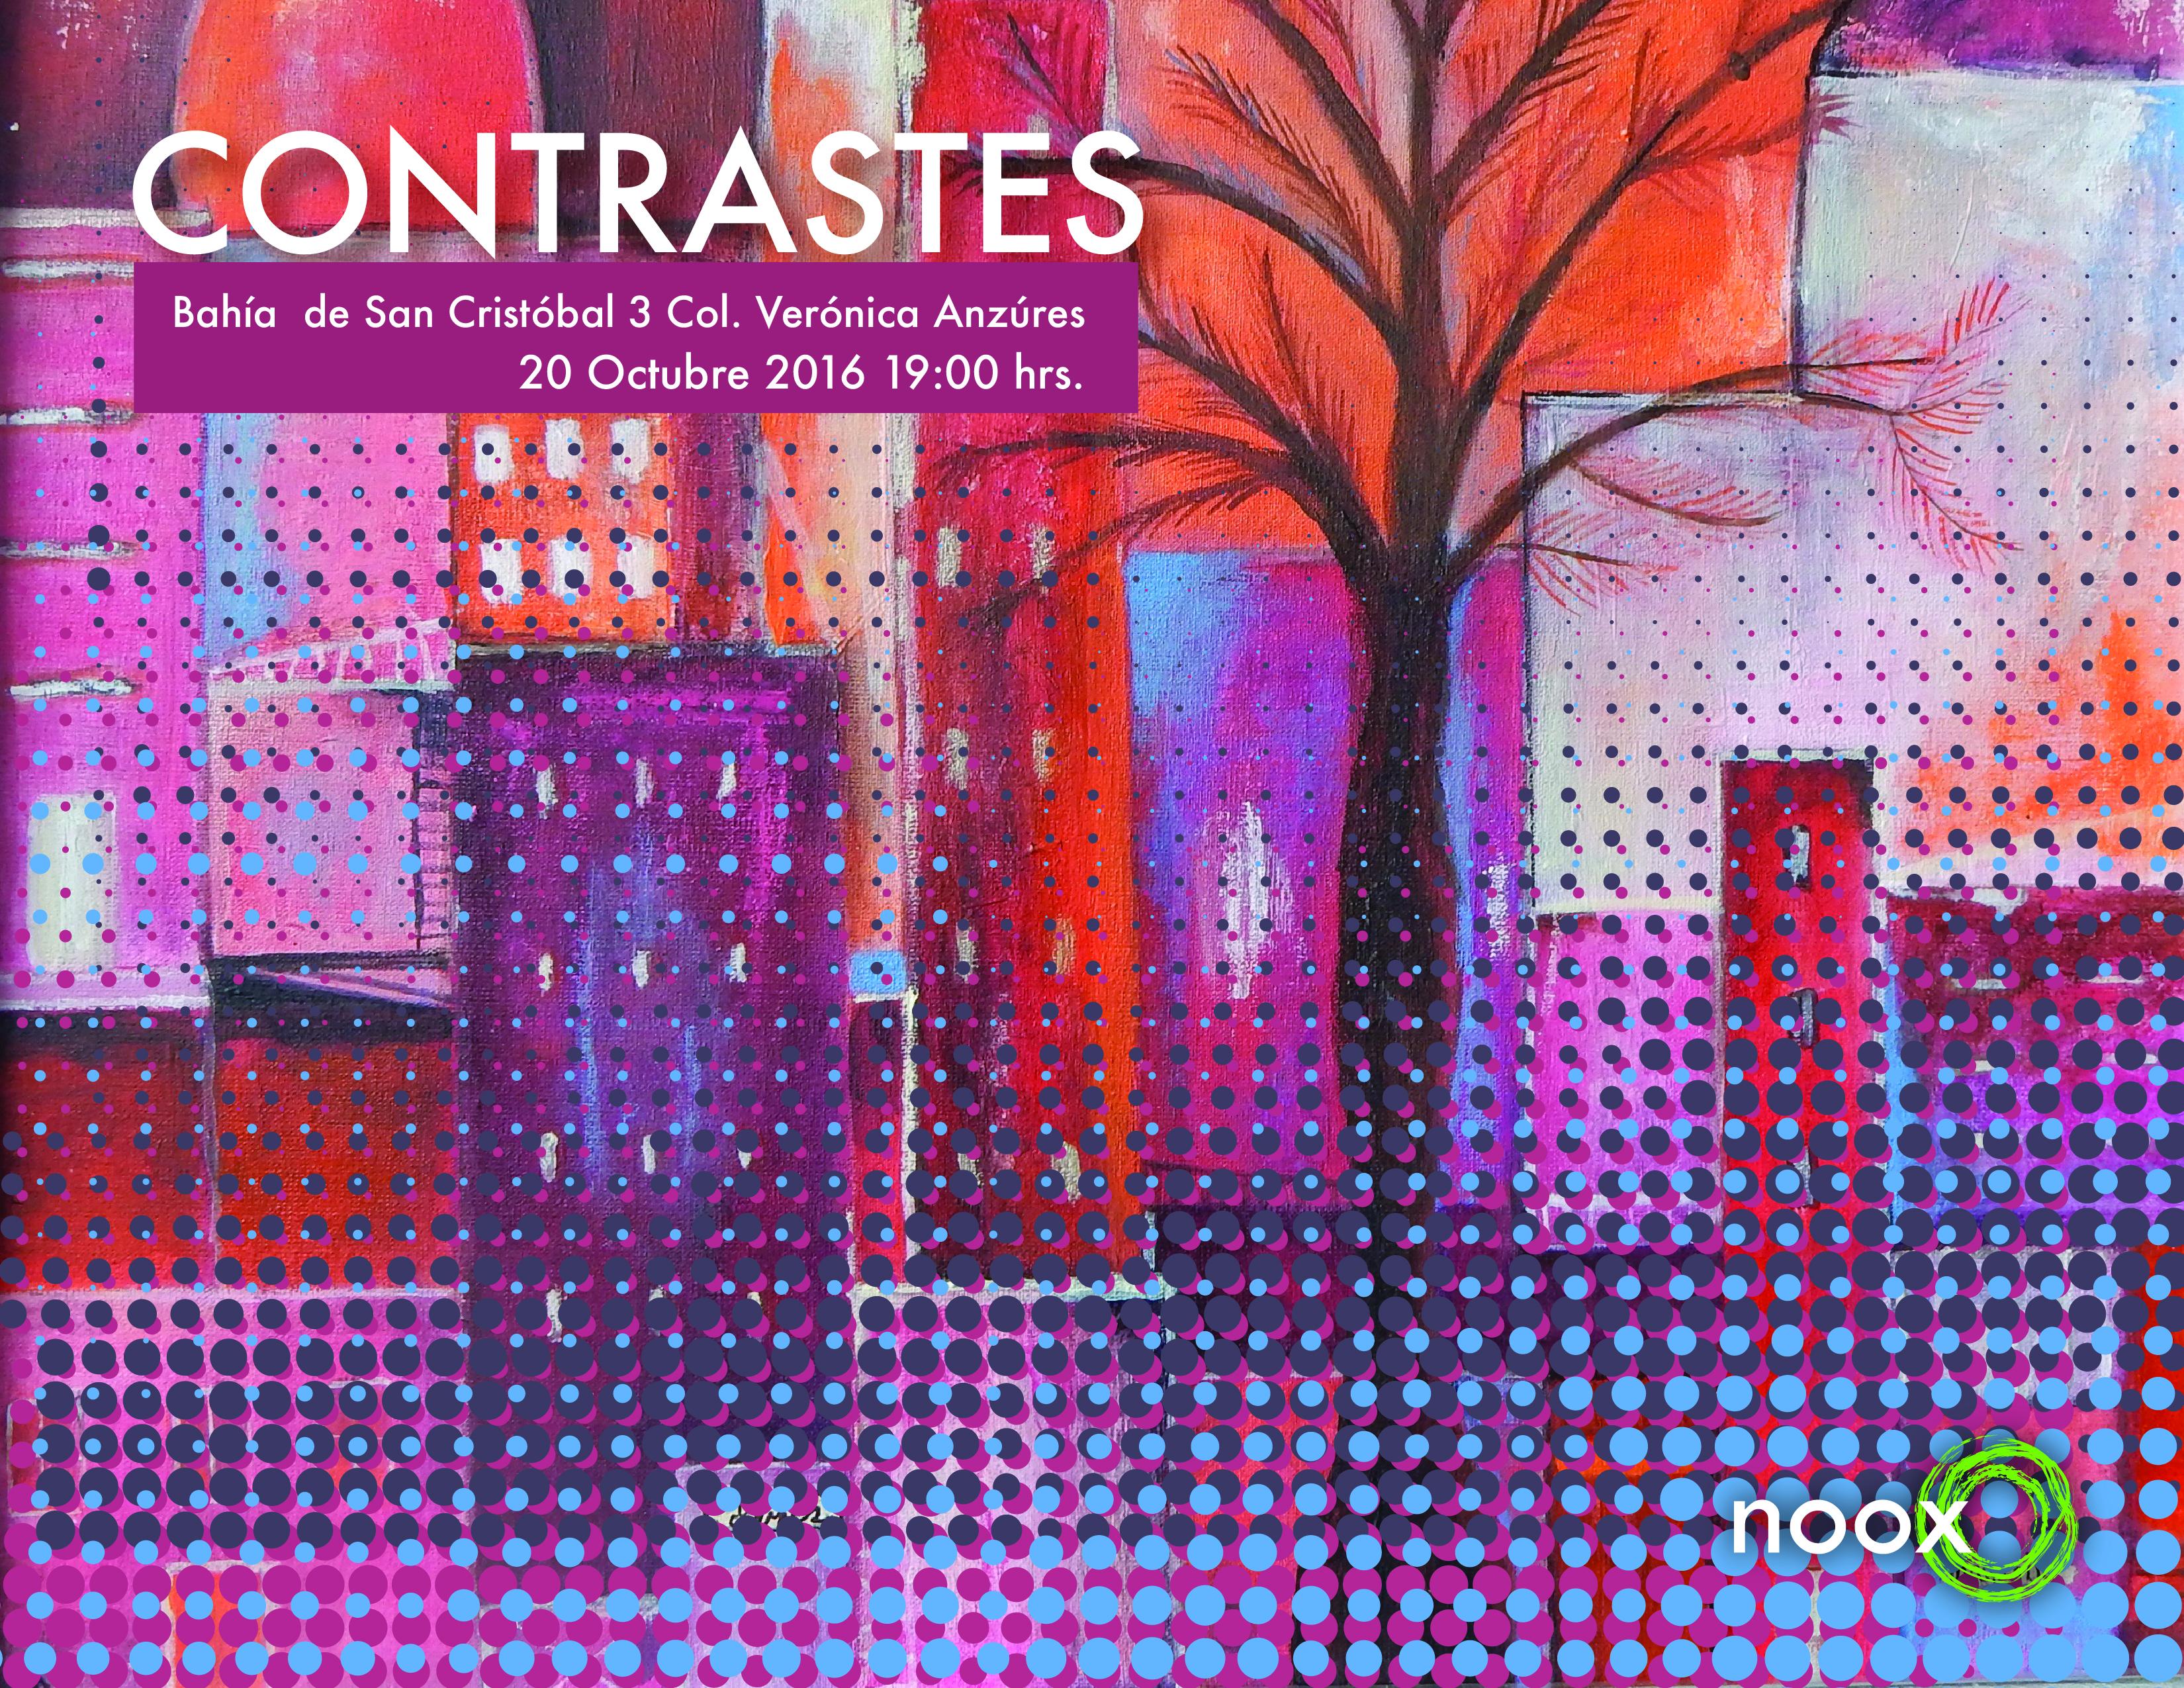 Contrastes-01